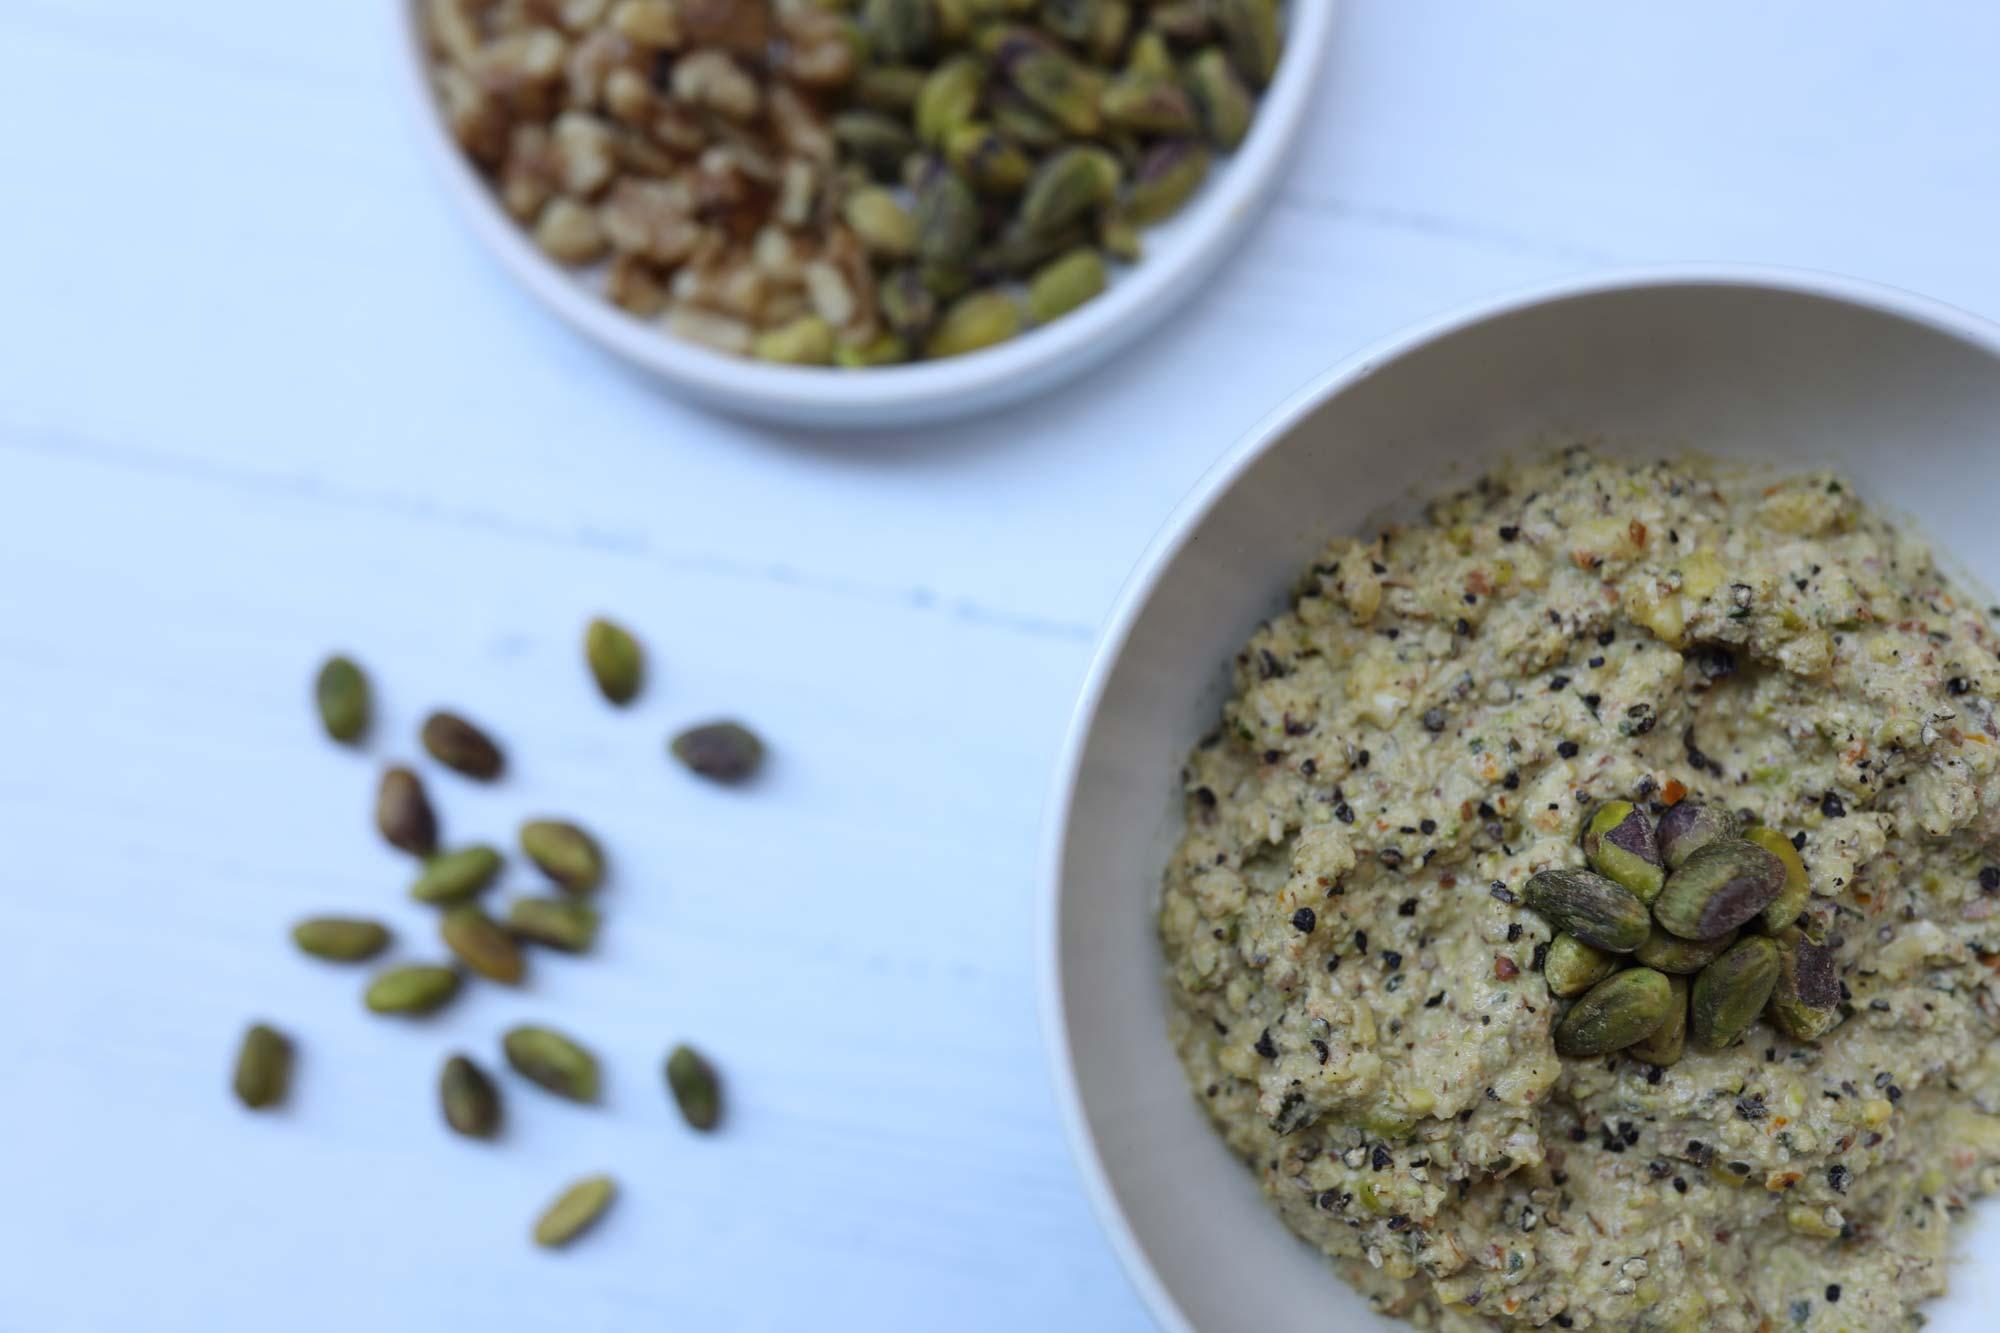 rawsome nut dip in bowl